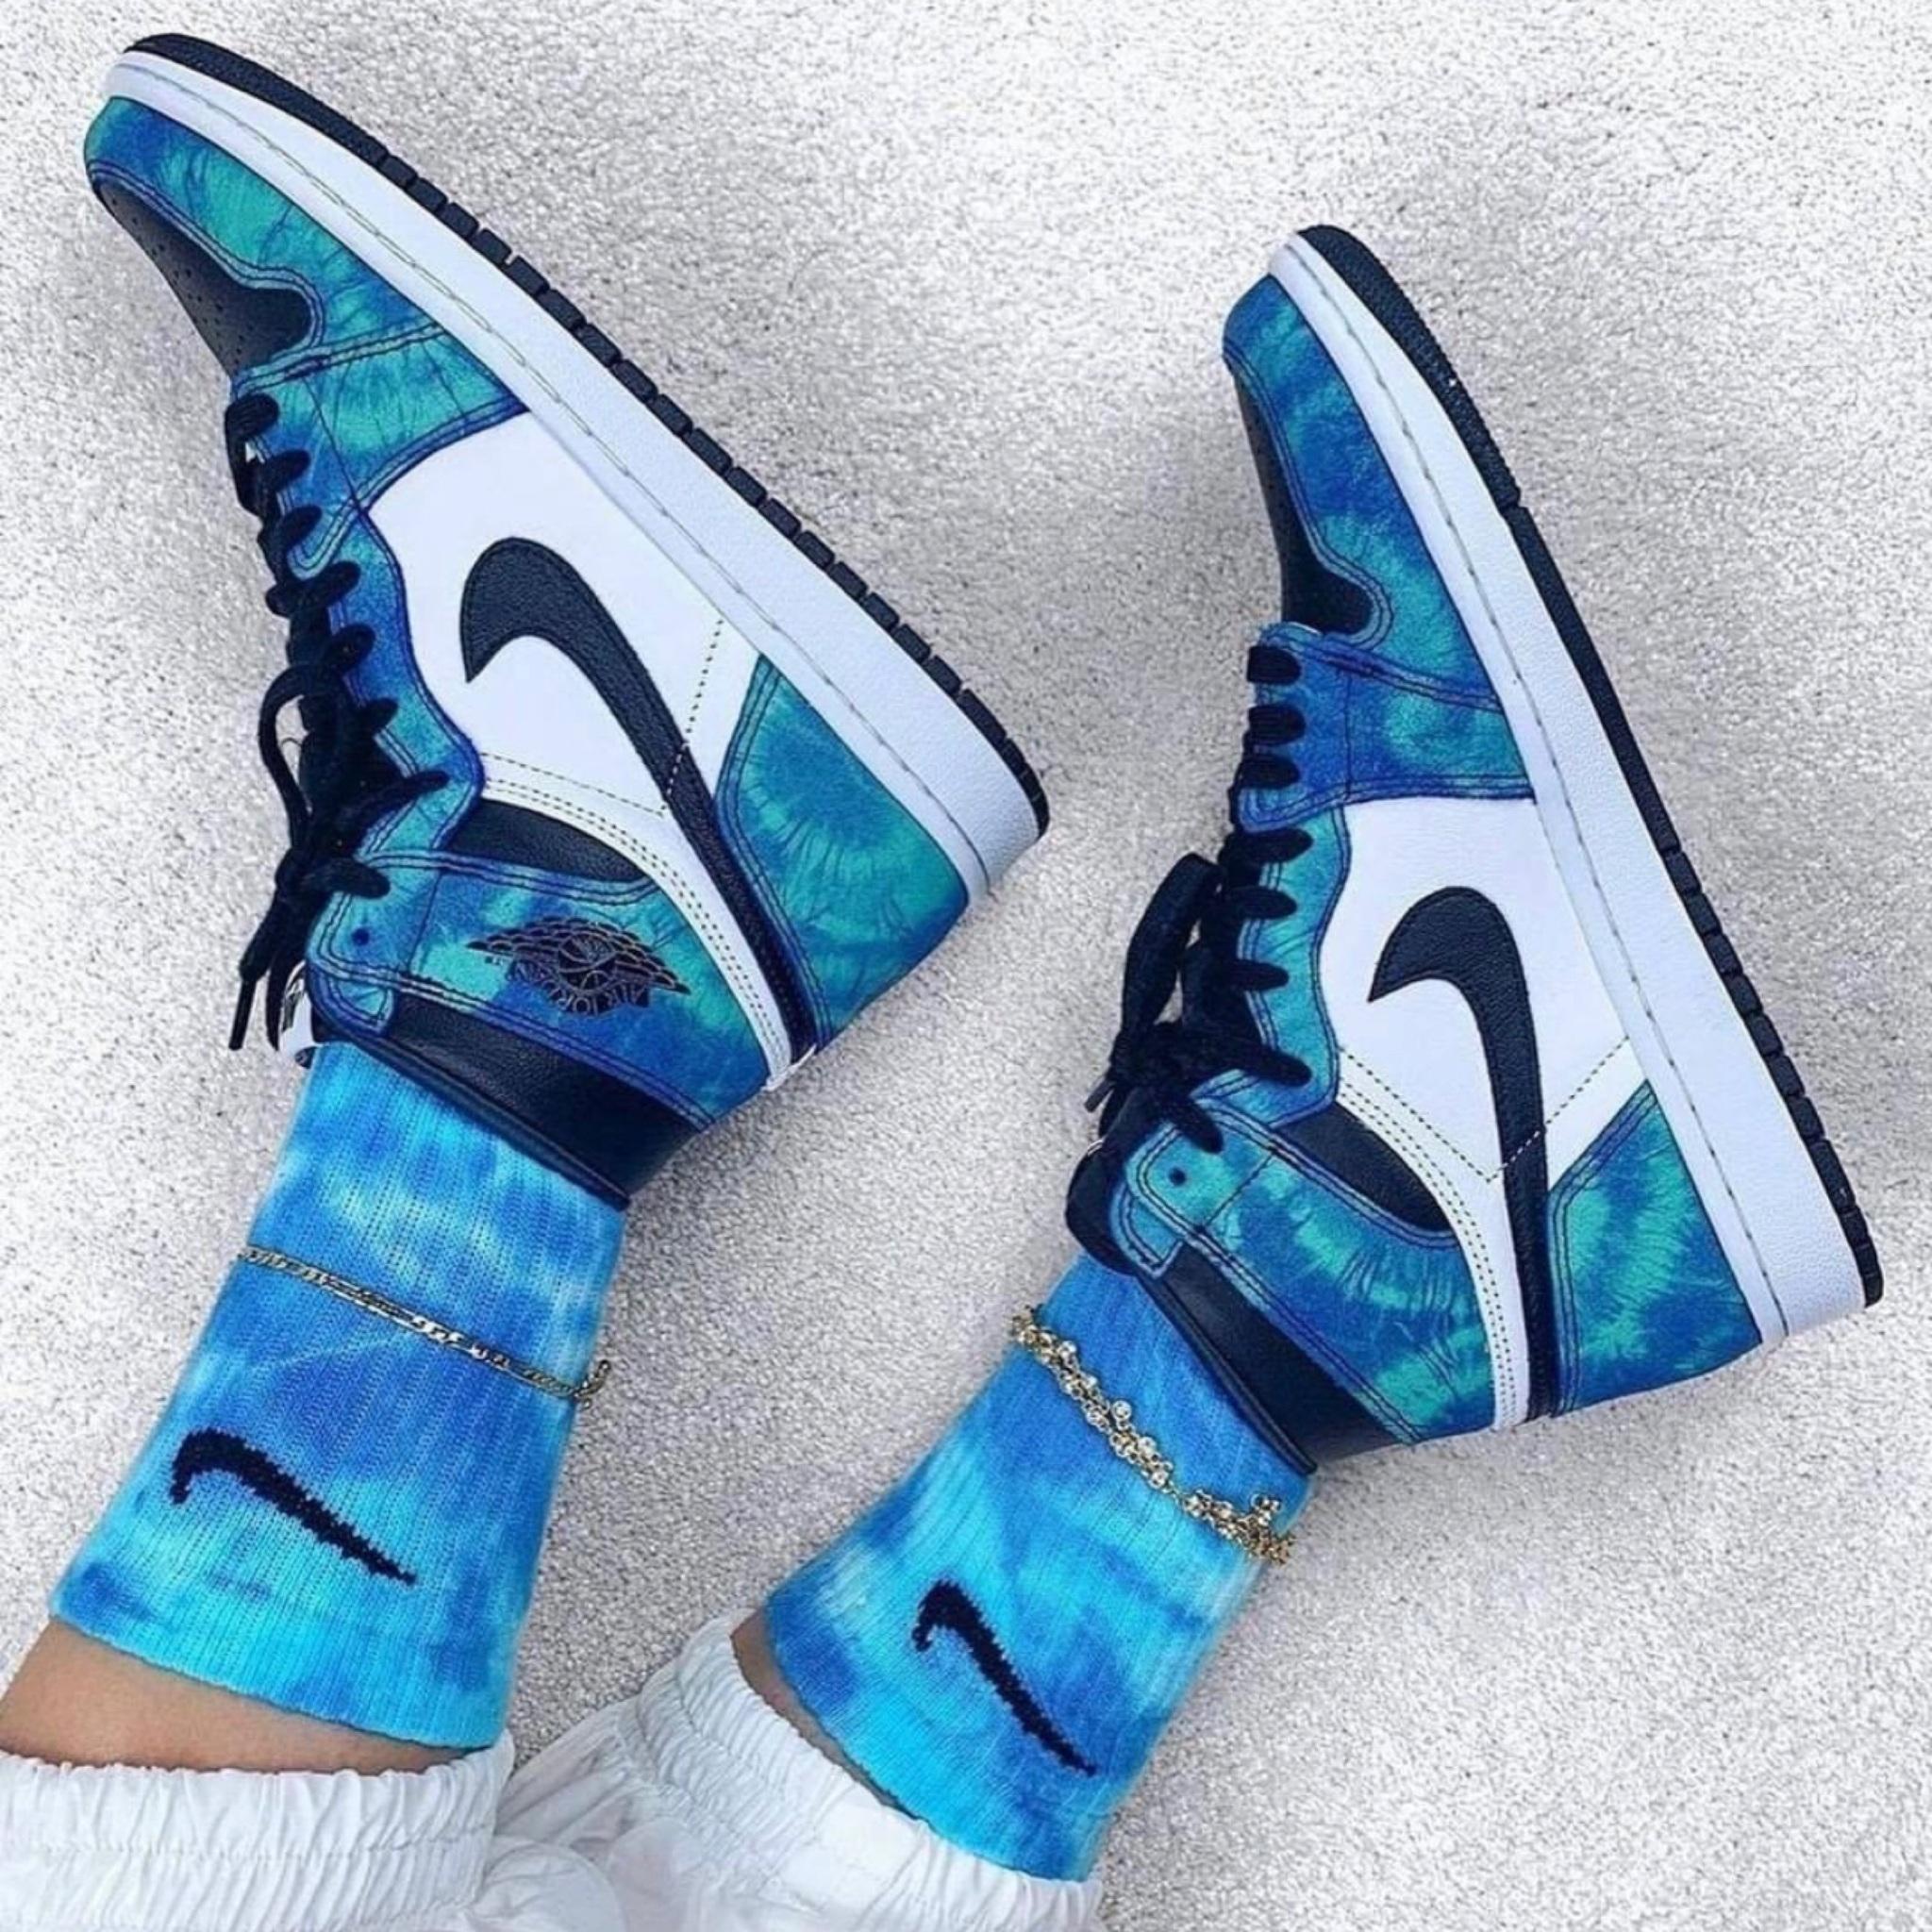 Nike Air Jordan 1 High Tie-Dye